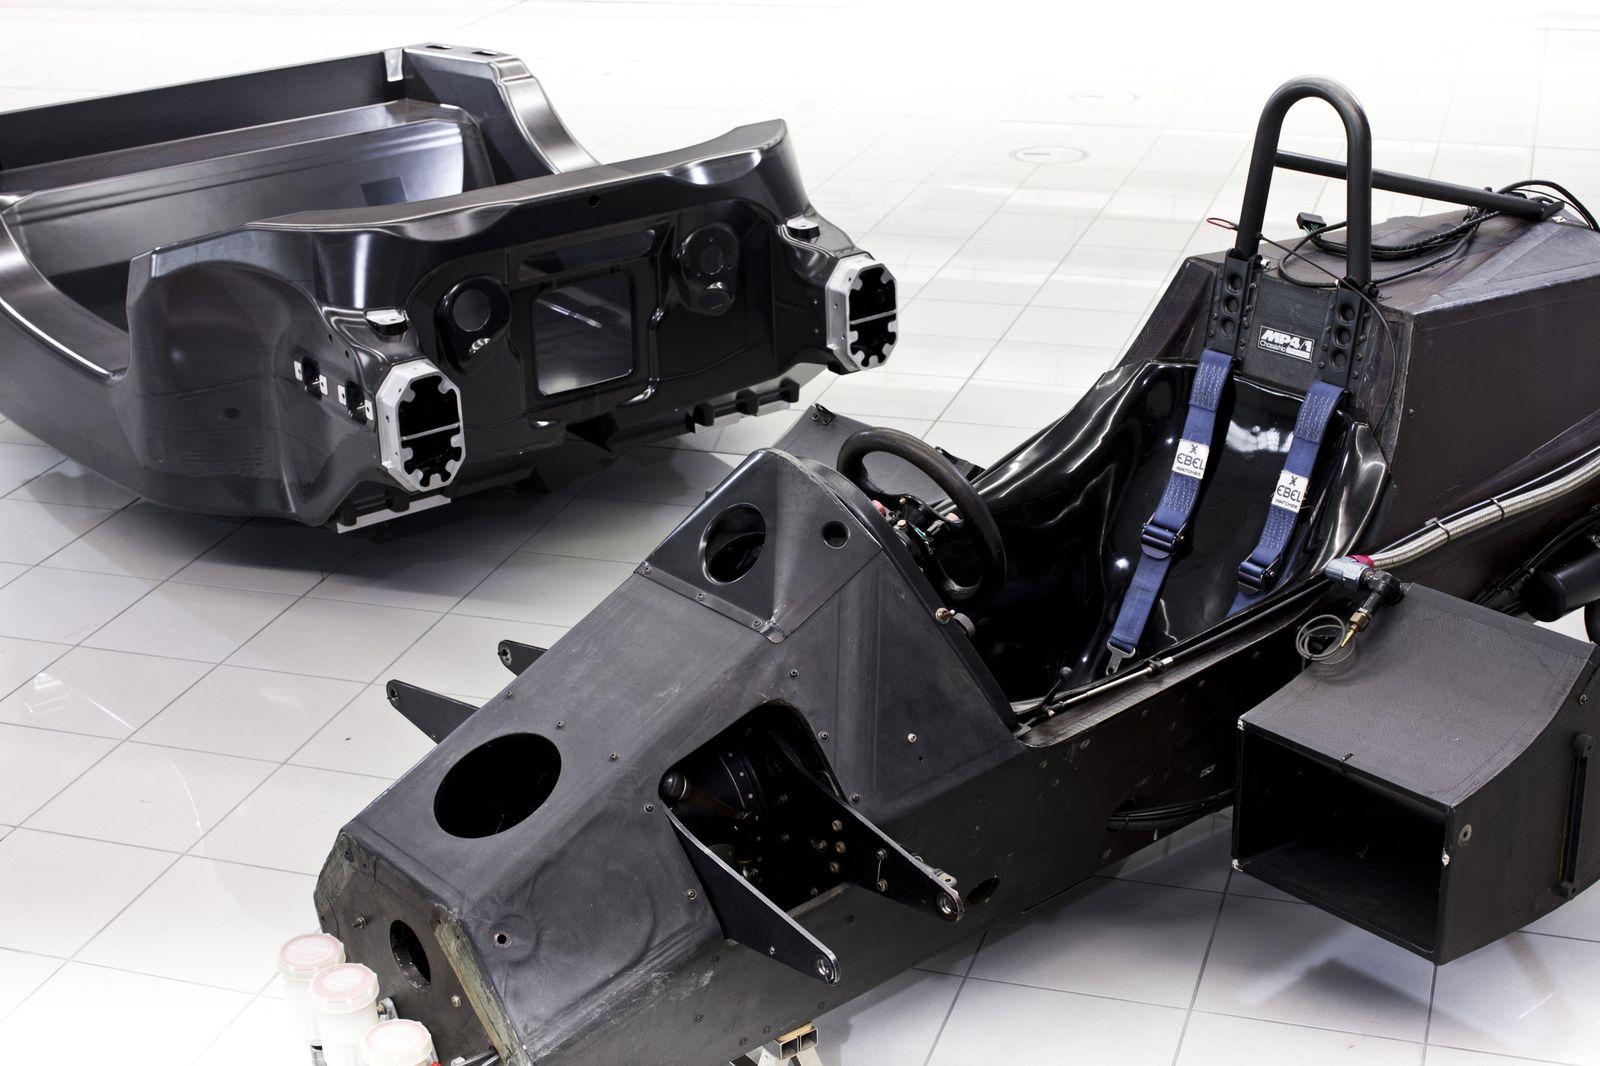 Chassis design of f1 car - 63190_h_mclar Jpg